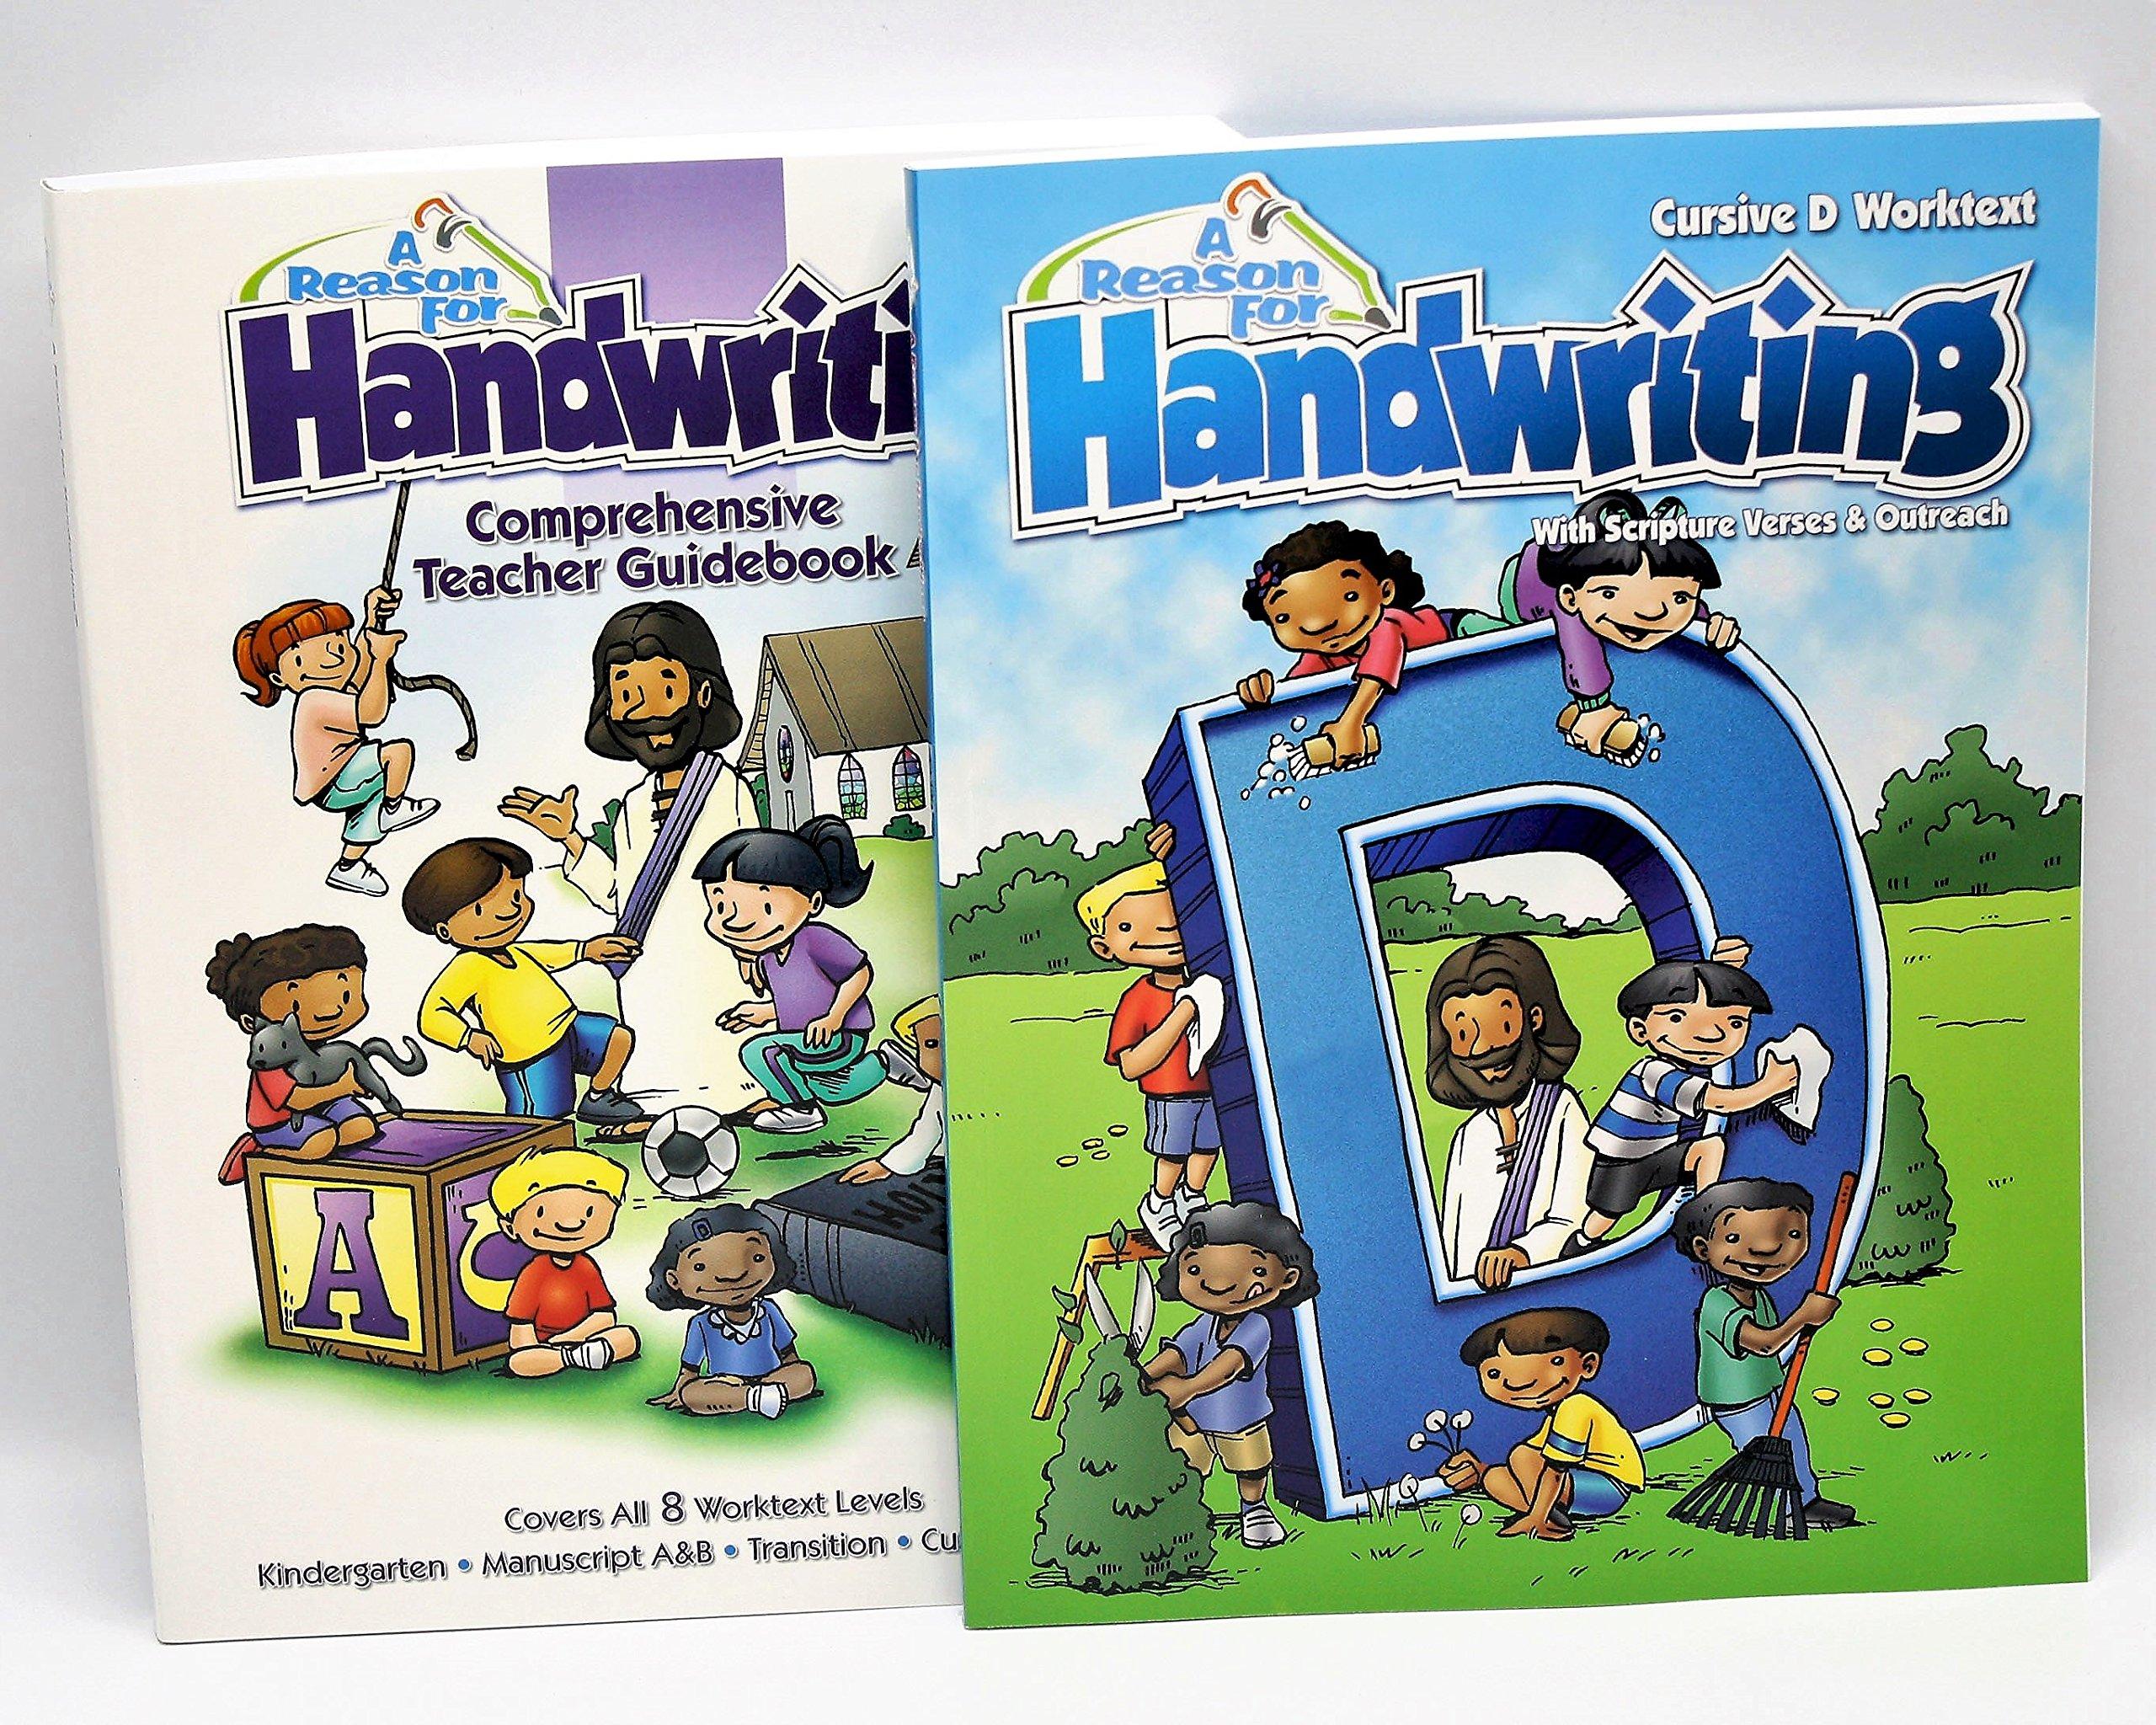 A Reason For Cursive Handwriting Workbook & Teacher Guidebook Level D, Grade 4 - Kids Writing Practice Books for 4th Graders & Beginners - Penmanship Workbooks for Homeschooling & Practicing